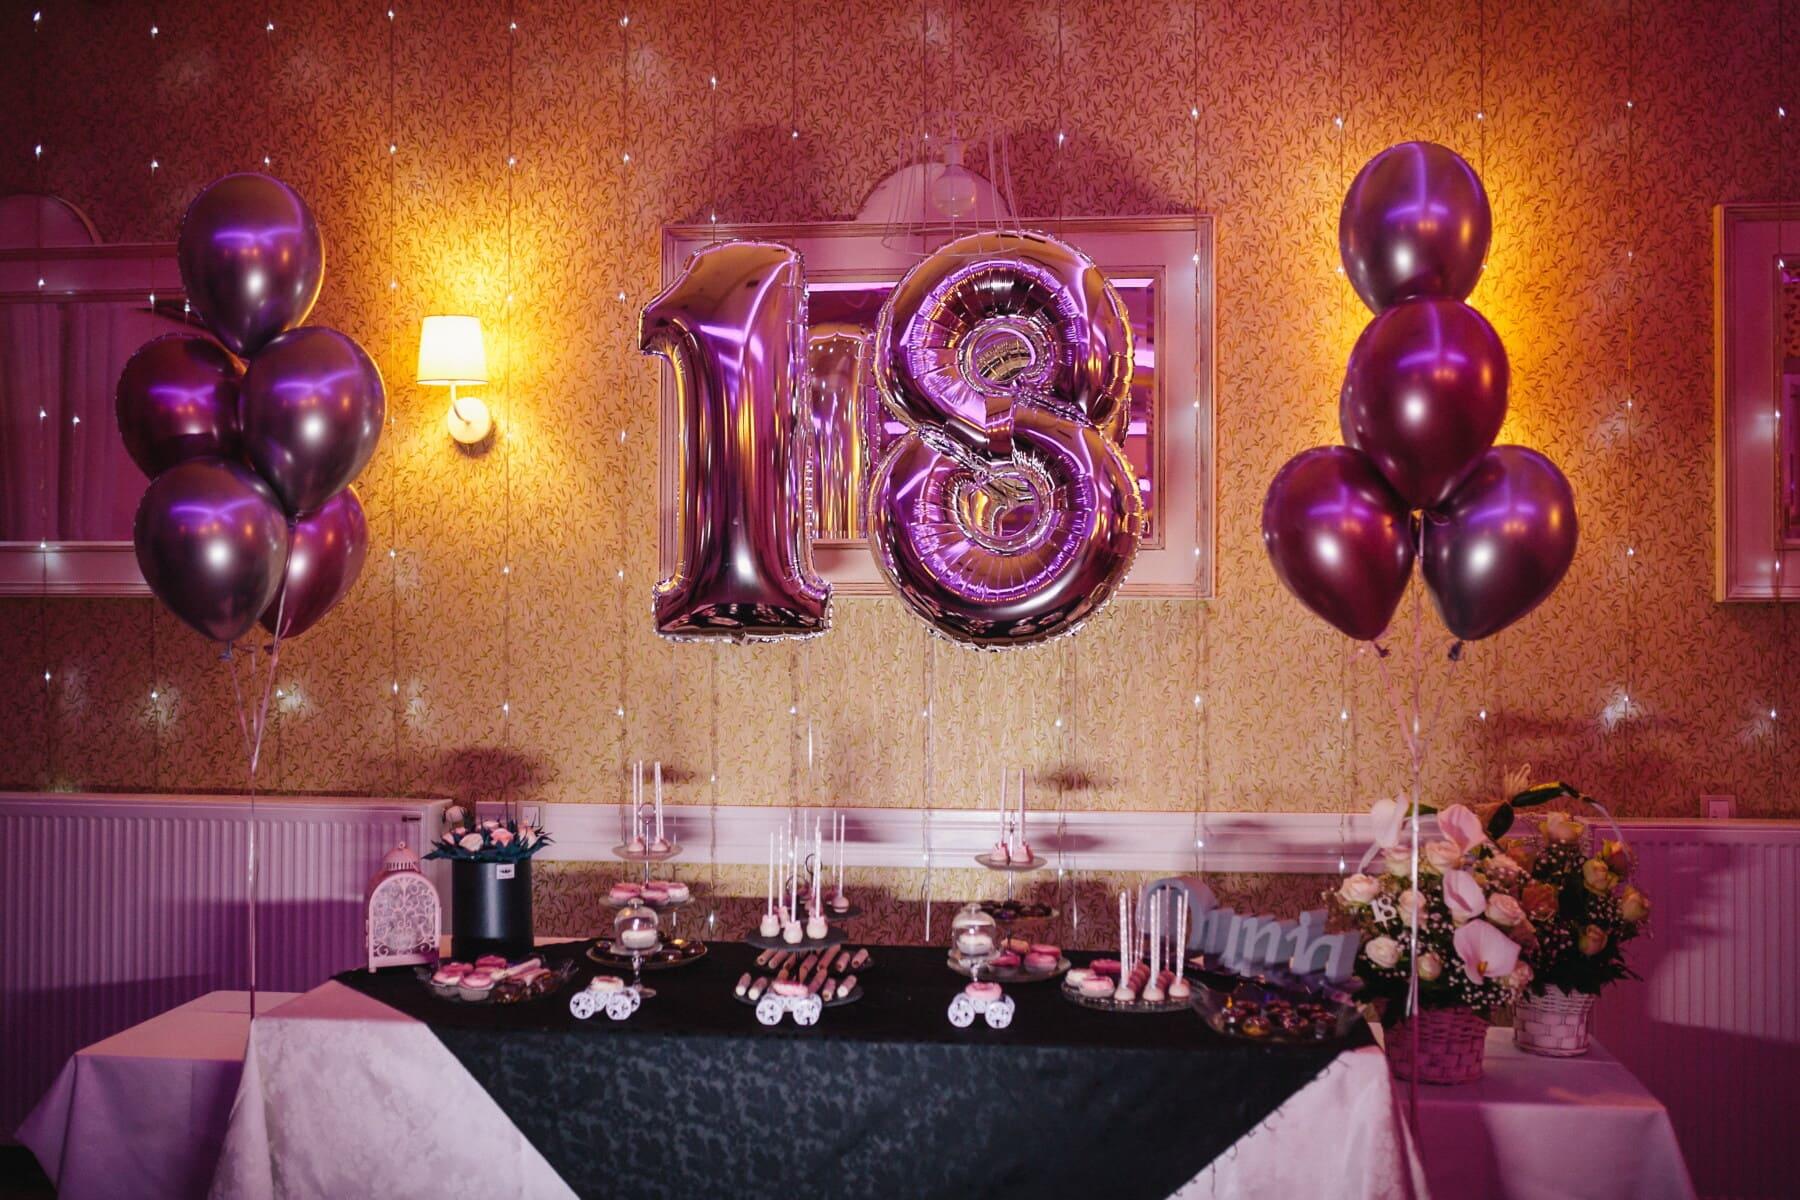 helium, balloon, 18 birthday, fancy, pinkish, teenage, decoration, party, interior design, light